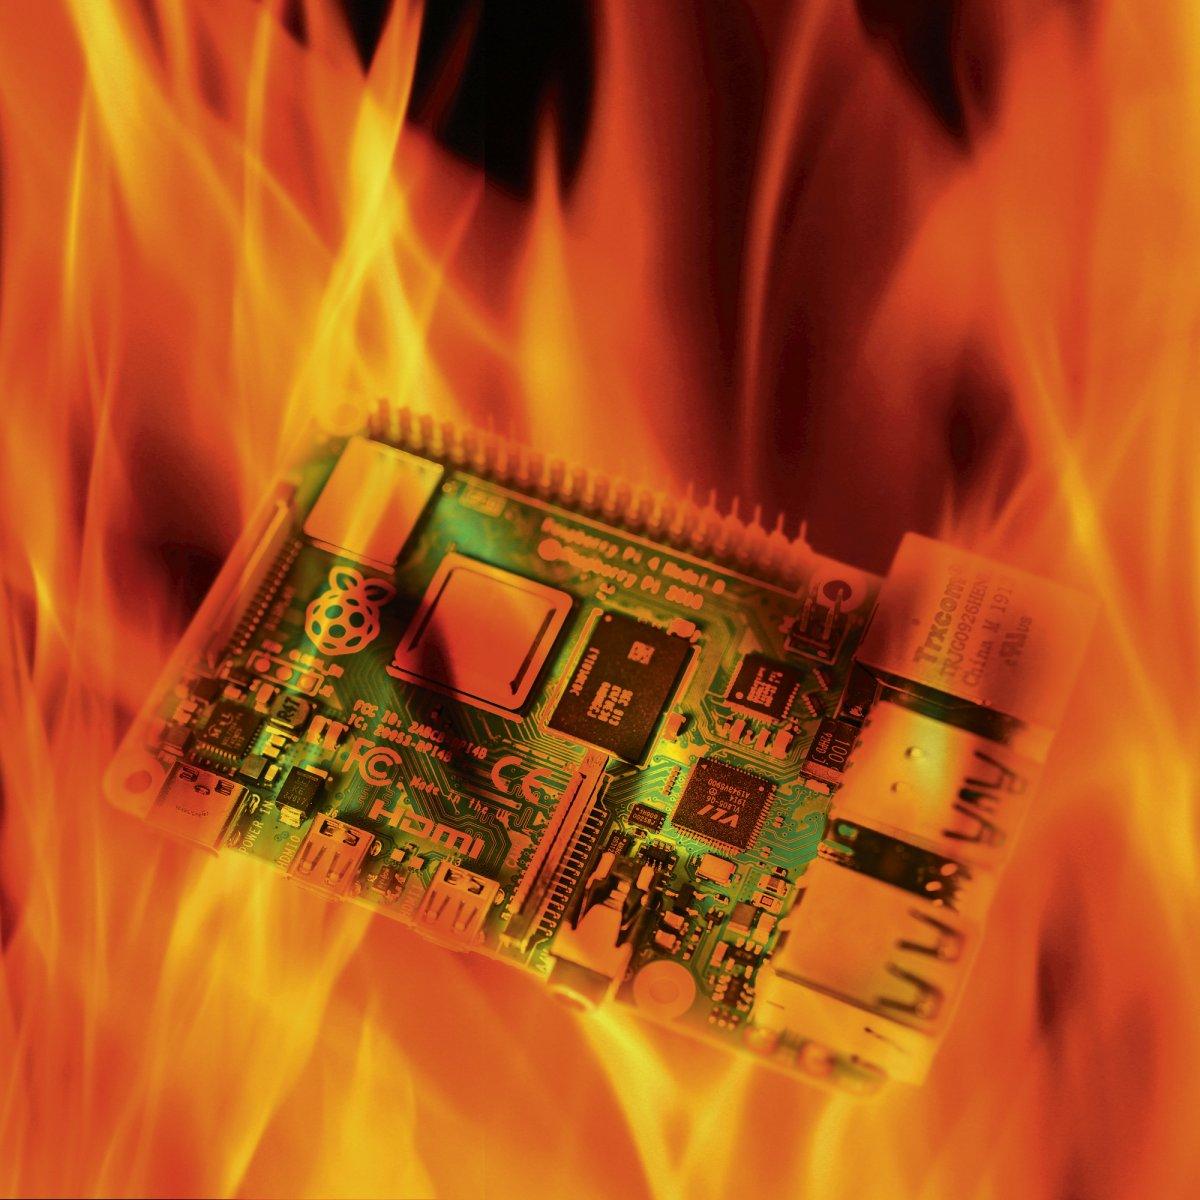 Bastelrechner hochgetaktet: Raspberry Pi mit 2100 MHz